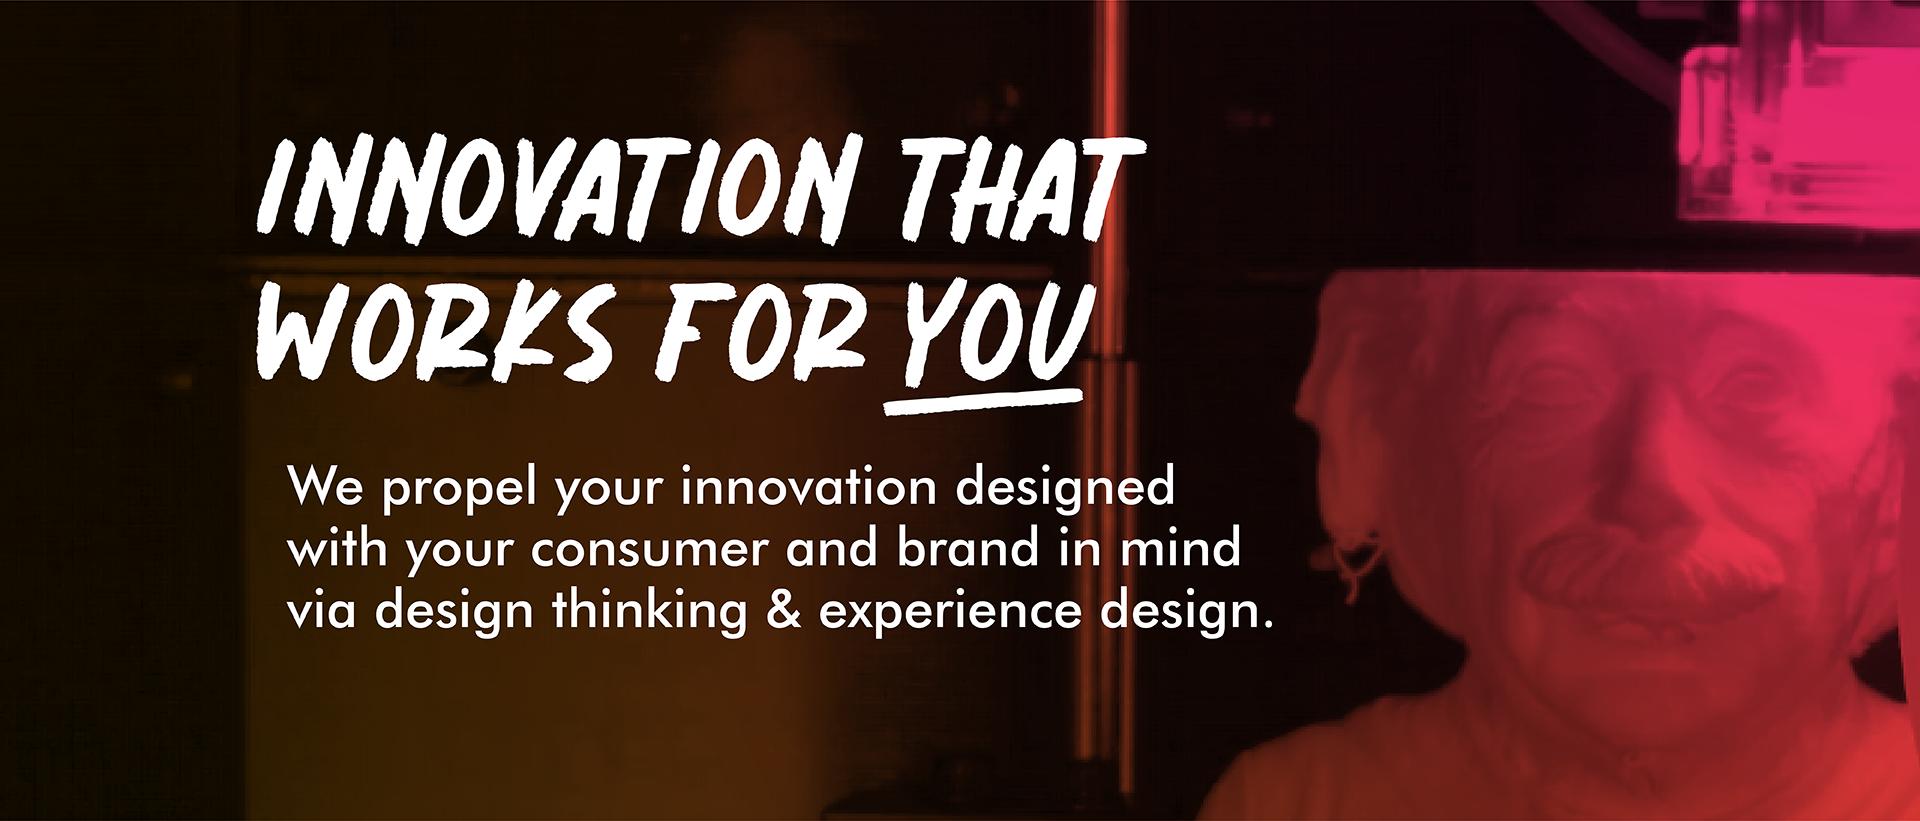 Header Image: Innovation that works for you